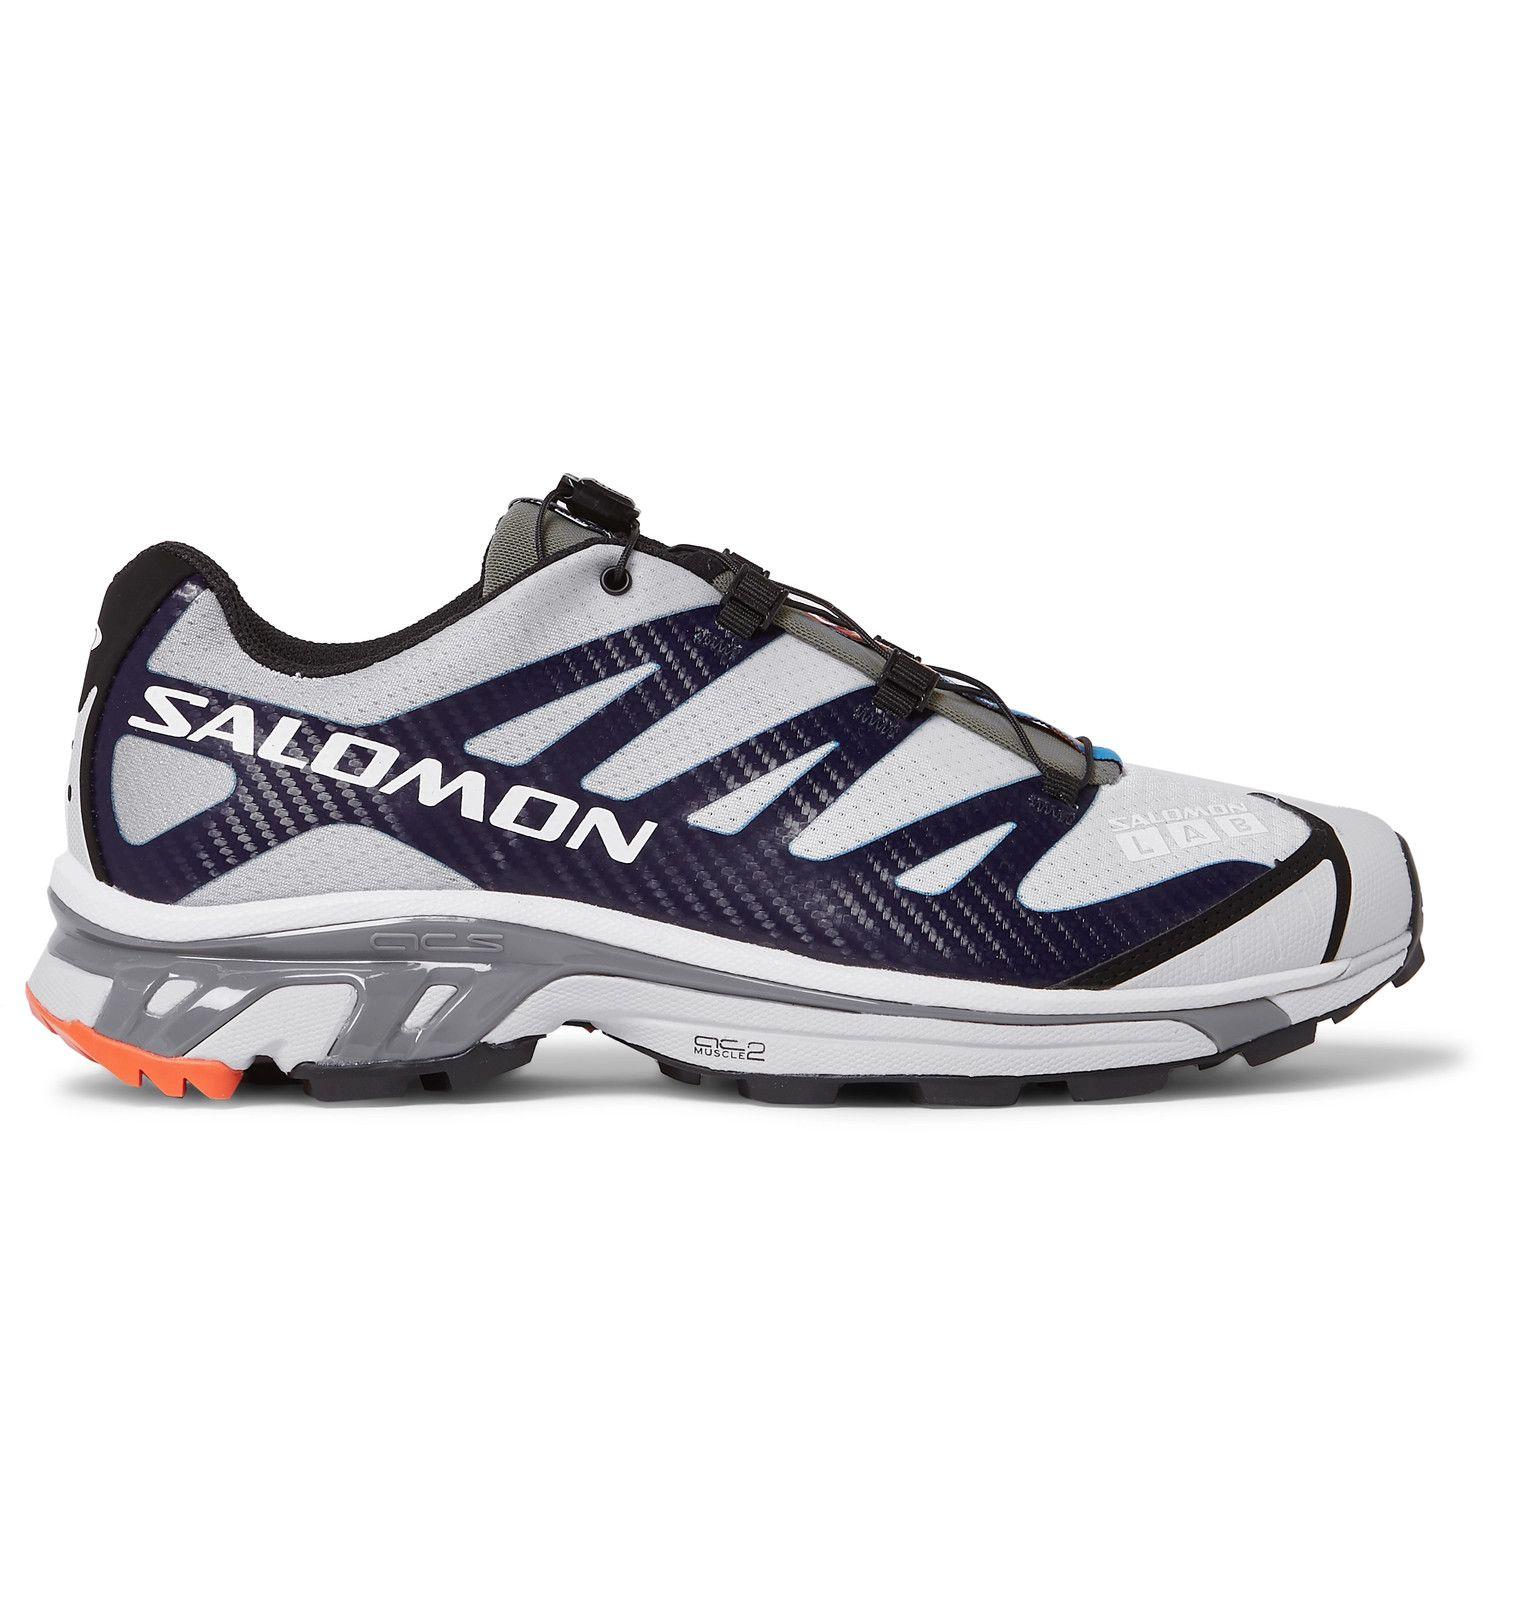 Salomon S Lab Xt 4 Adv Running Sneakers Men Gray Salomon Shoes Mens Sneakers Salomon Shoes